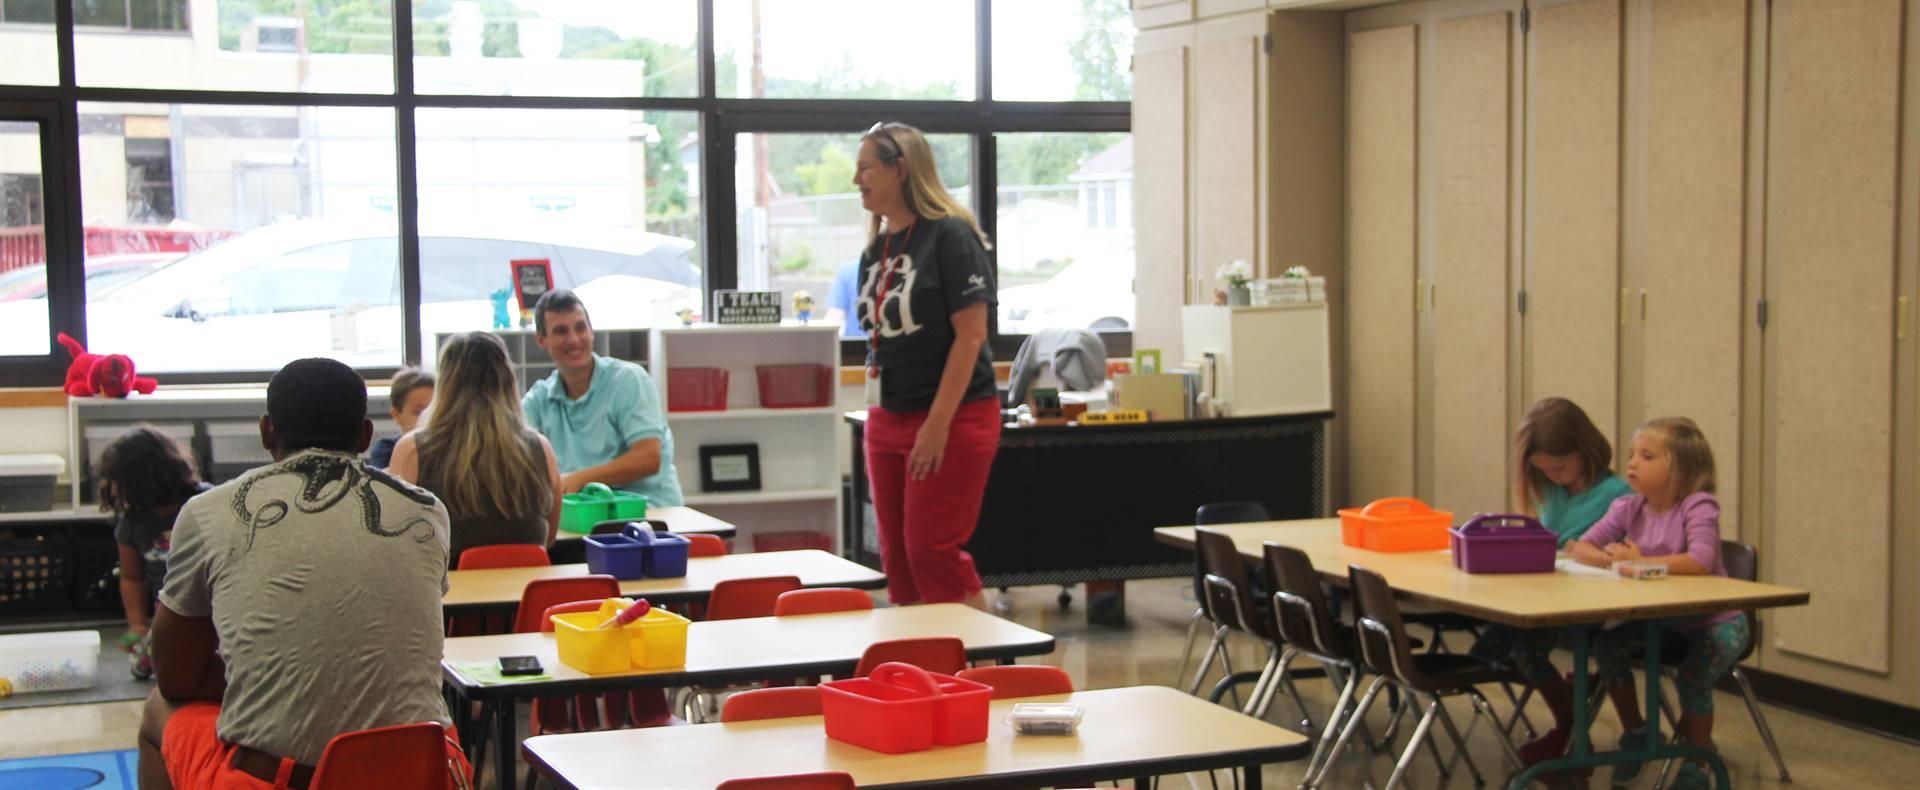 8-27-19 Elementary Summer Open House 8